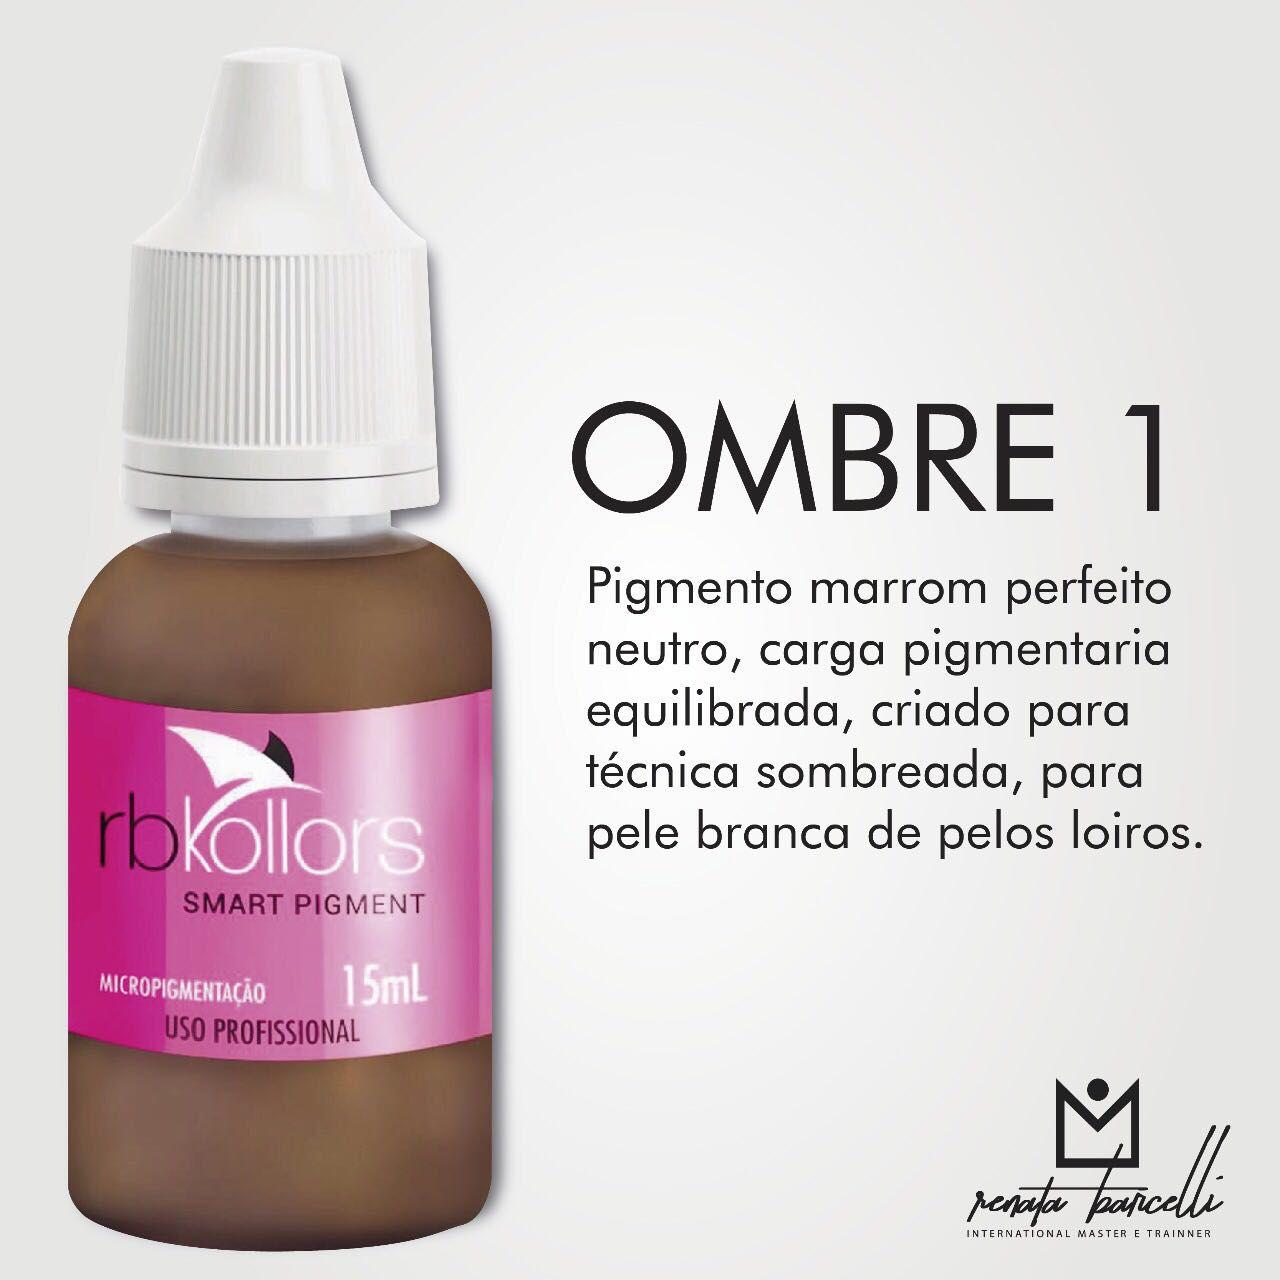 PIGMENTO RB KOLLORS - OMBRE 1  - Misstética